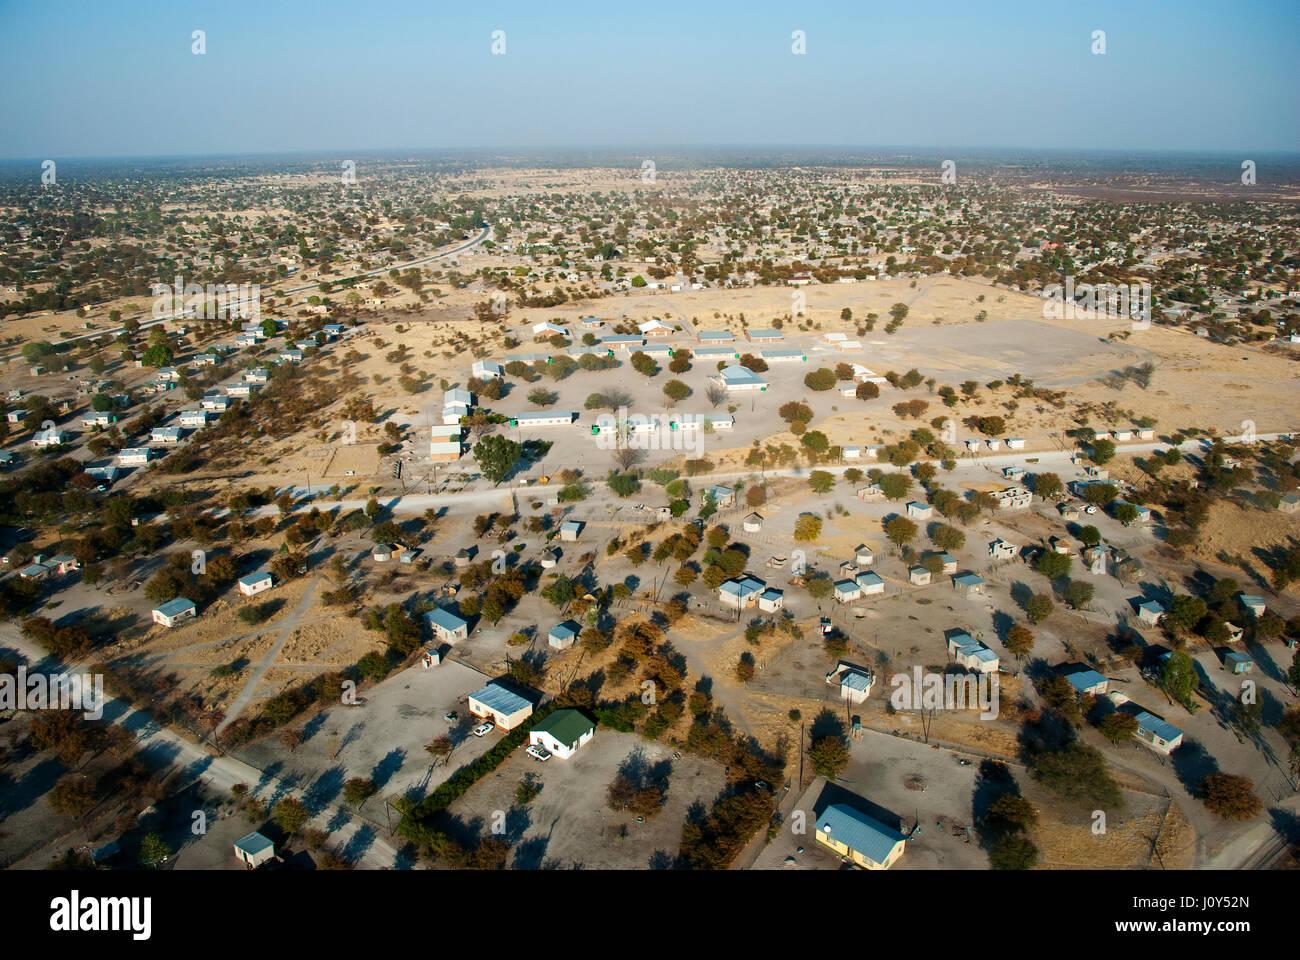 Aerial view of Maun town near the Okavango Delta, Botswana - Stock Image